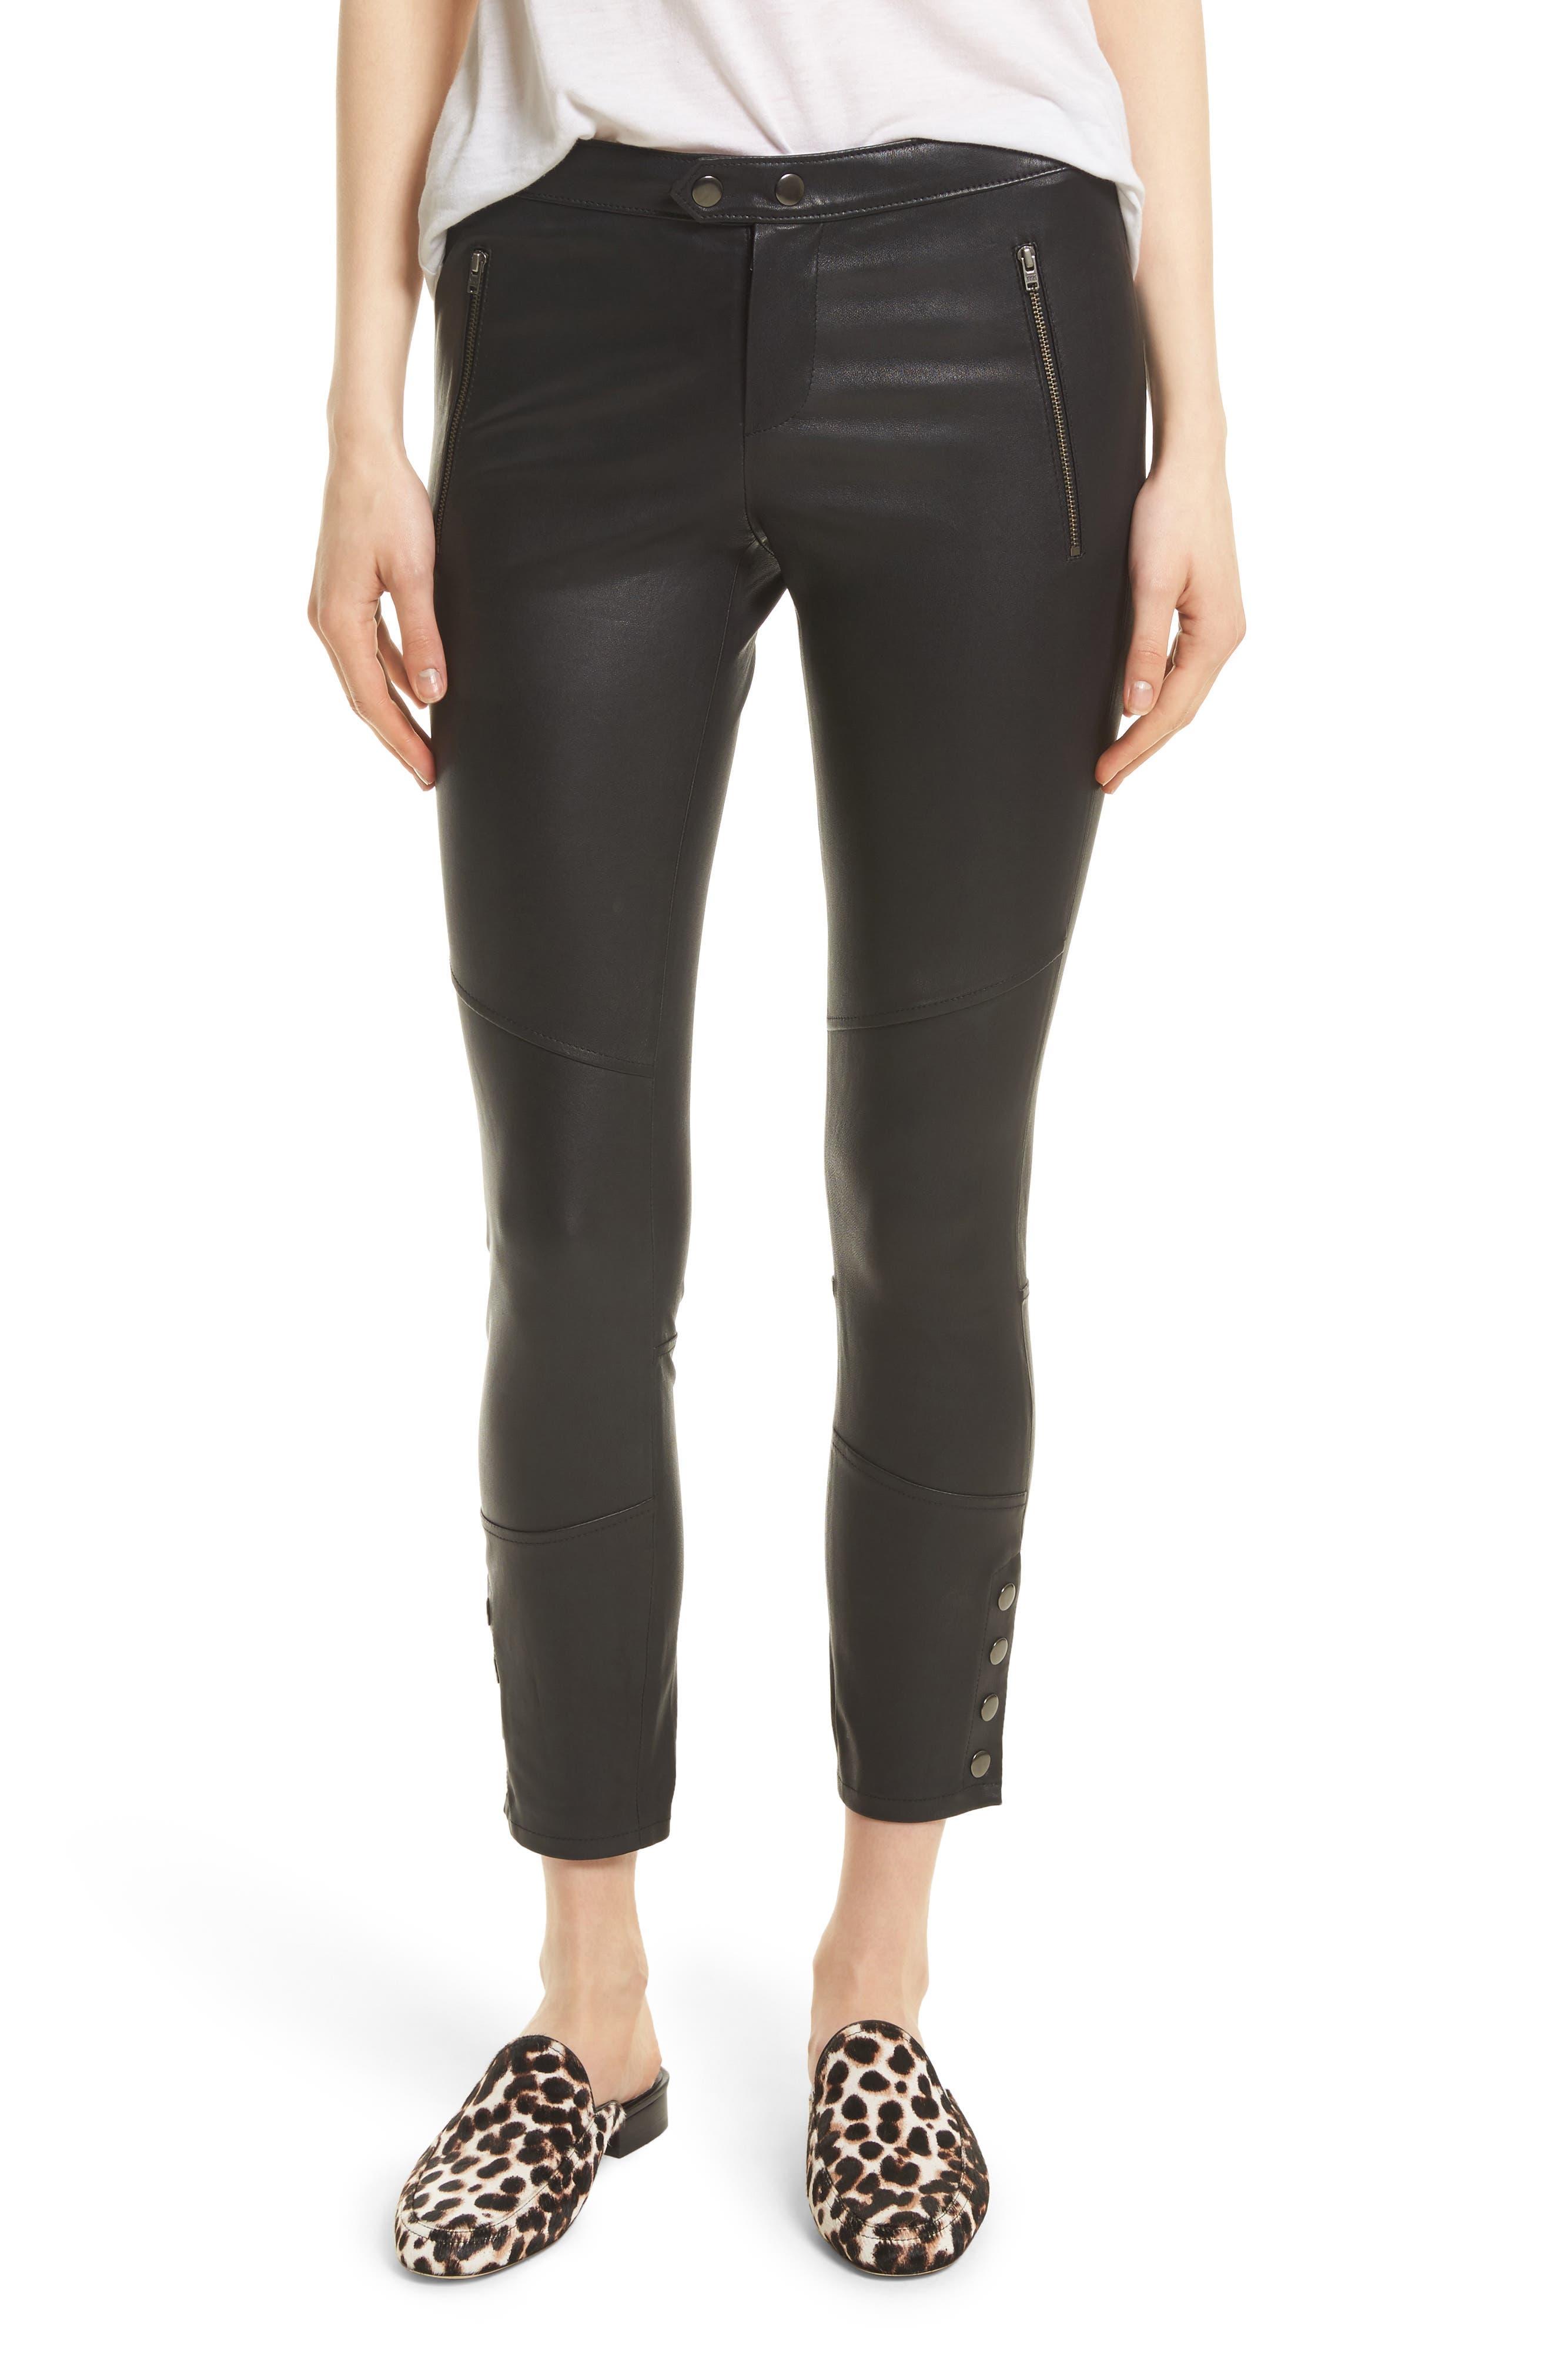 Darnella Leather Pants,                             Main thumbnail 1, color,                             002